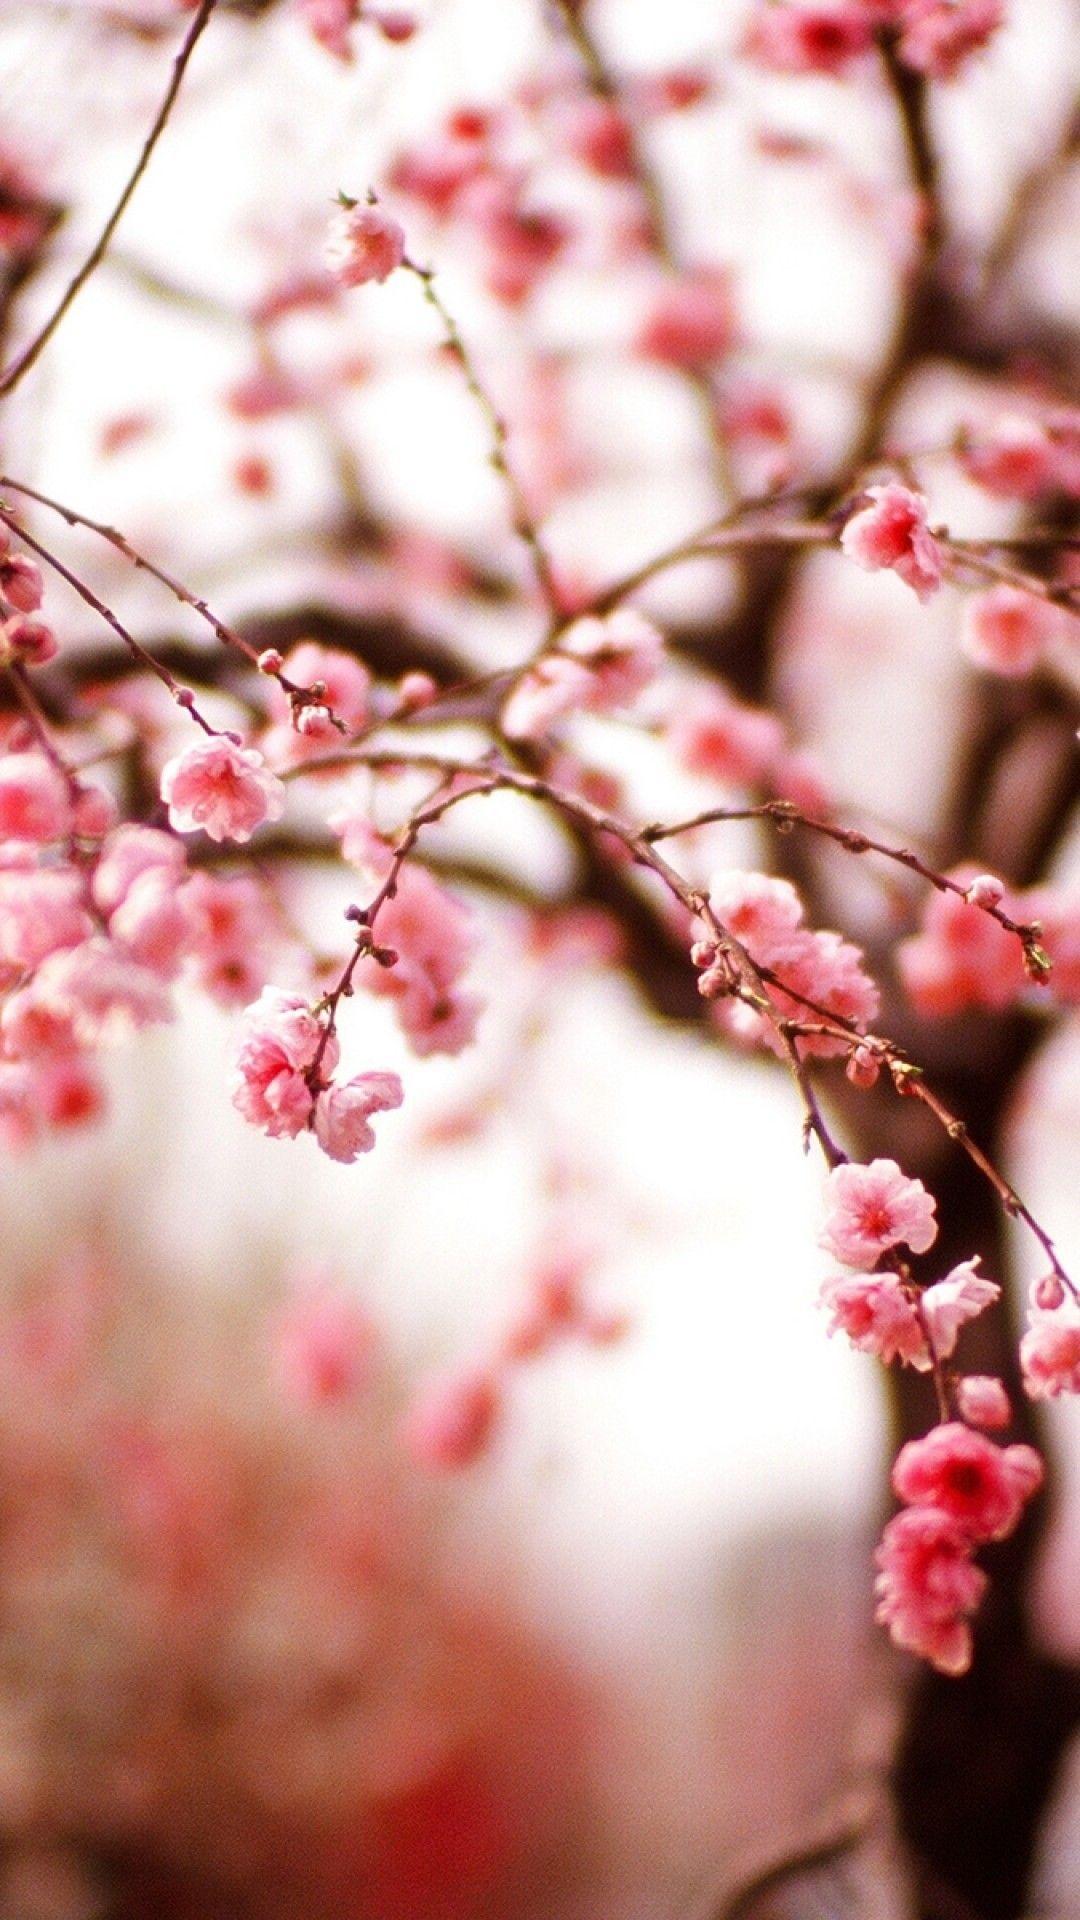 Wallpaper Iphone Sakura Hd